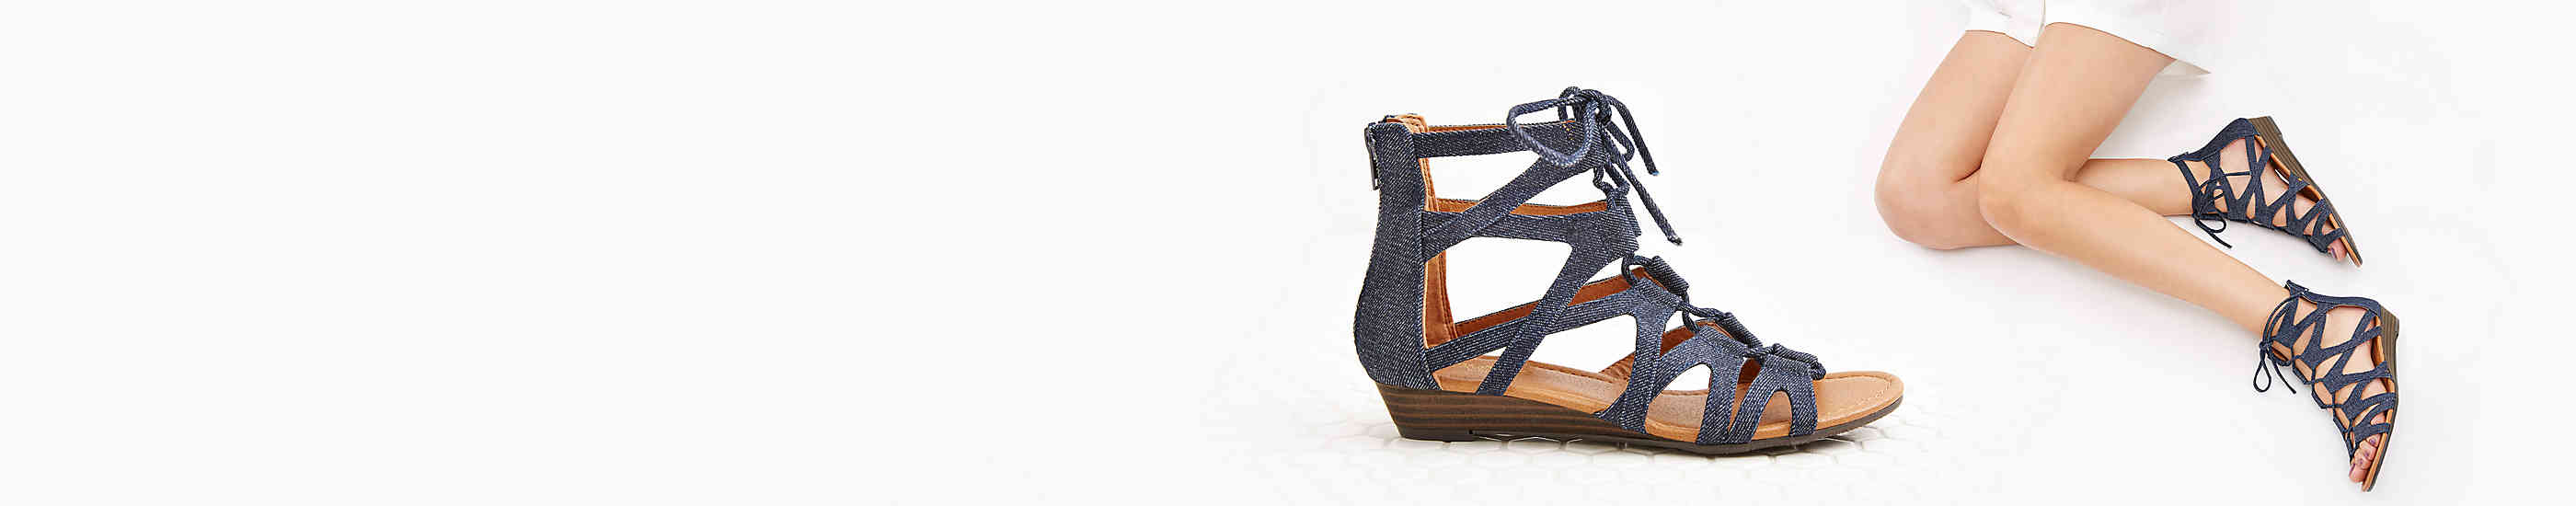 Womens sandals gladiator - Womens Sandals Gladiator 53